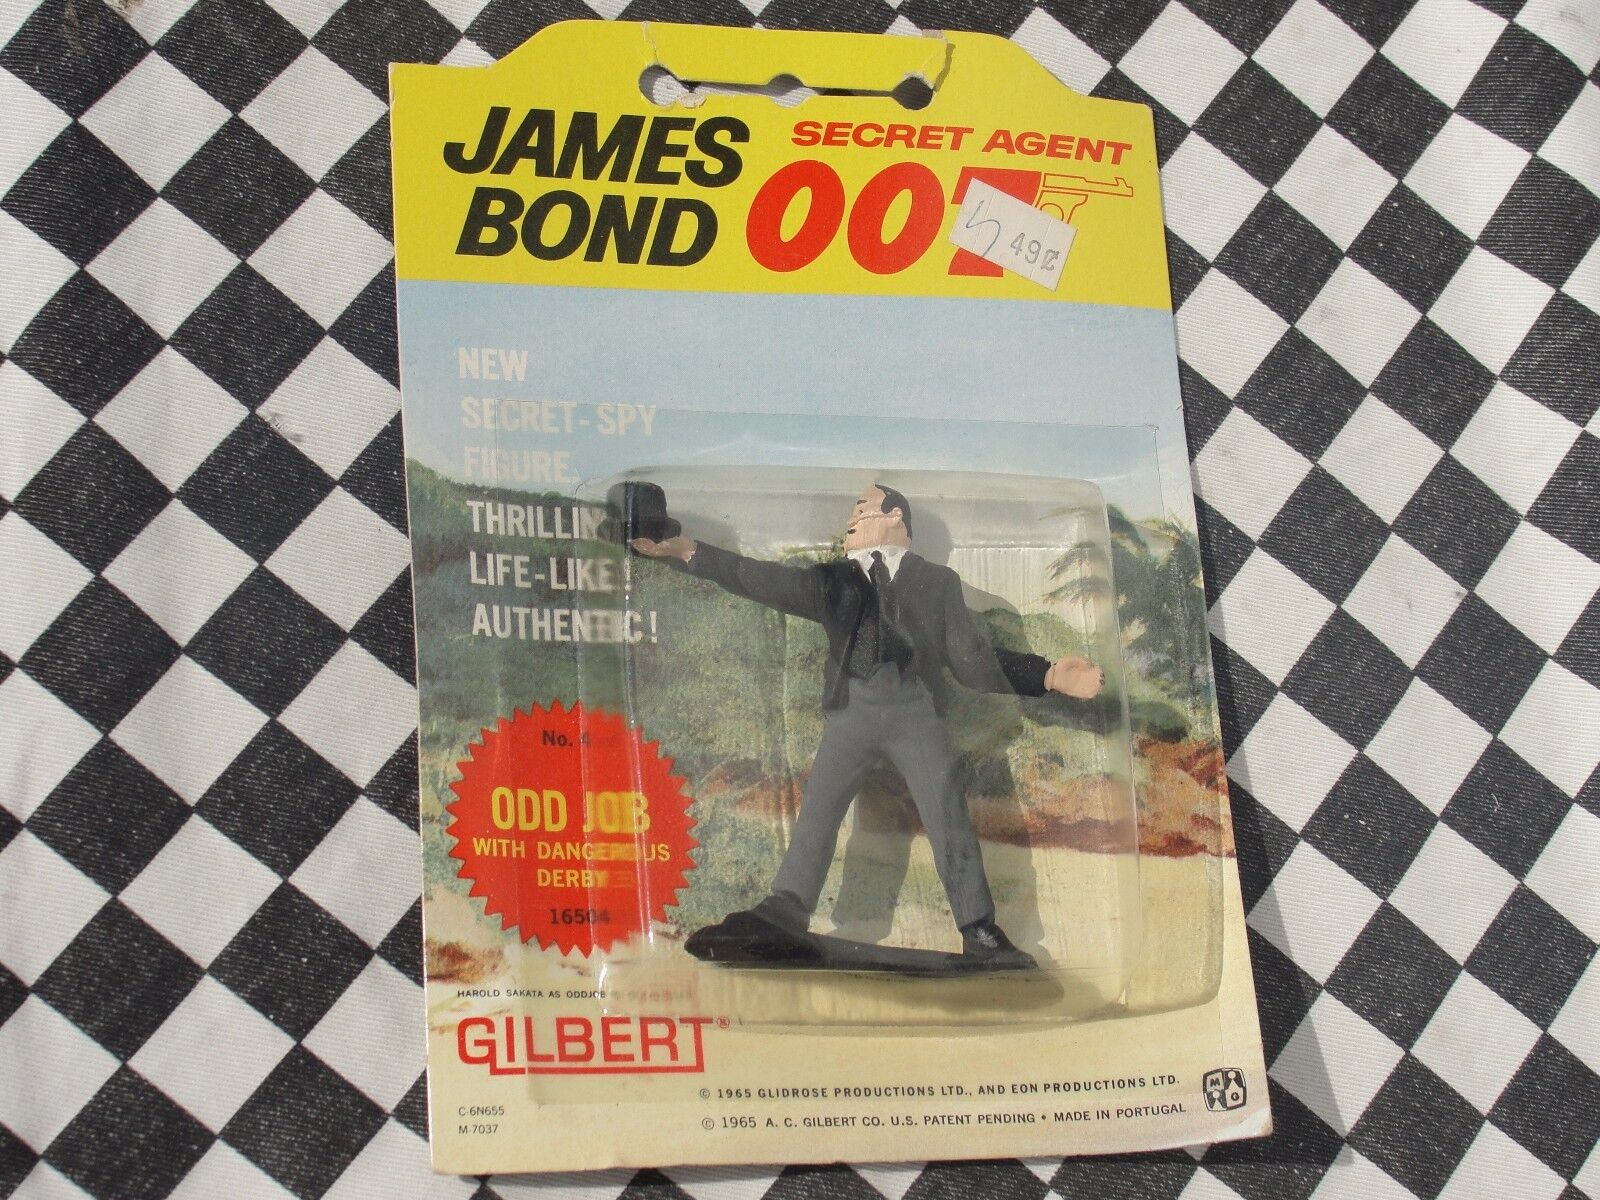 1960'S JAMES BOND SECRET AGENT 007 FIGURE  ODD JOB  16504  NEW OLD STOCK